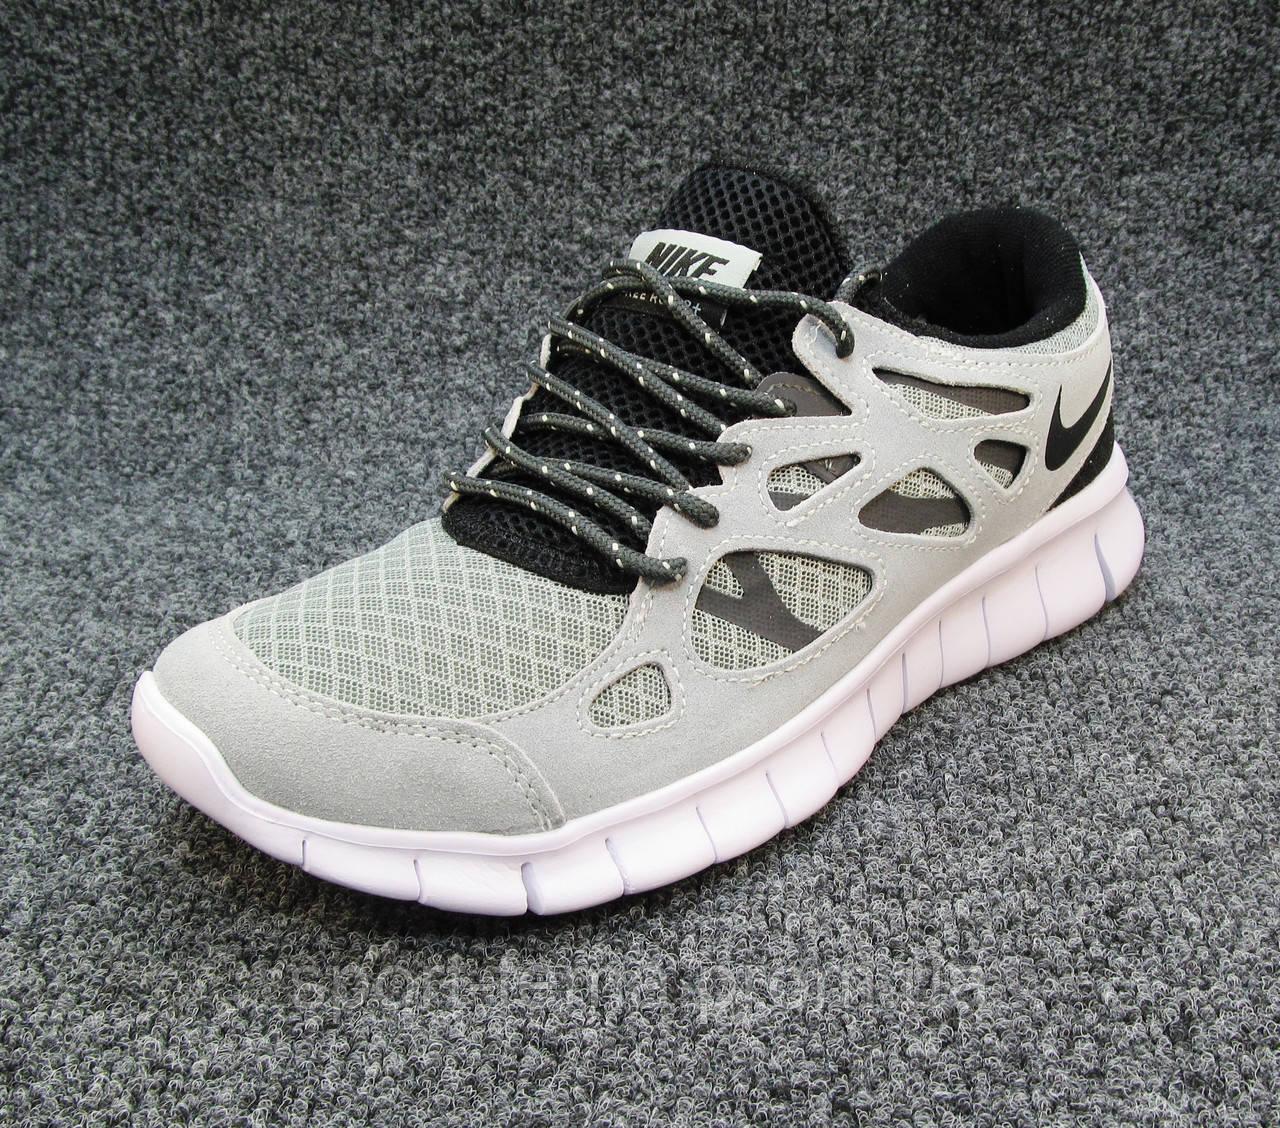 1c450d5b ... Кроссовки мужские Nike Free Run 2+ текстиль светло-серые (найк фри ран)  ...